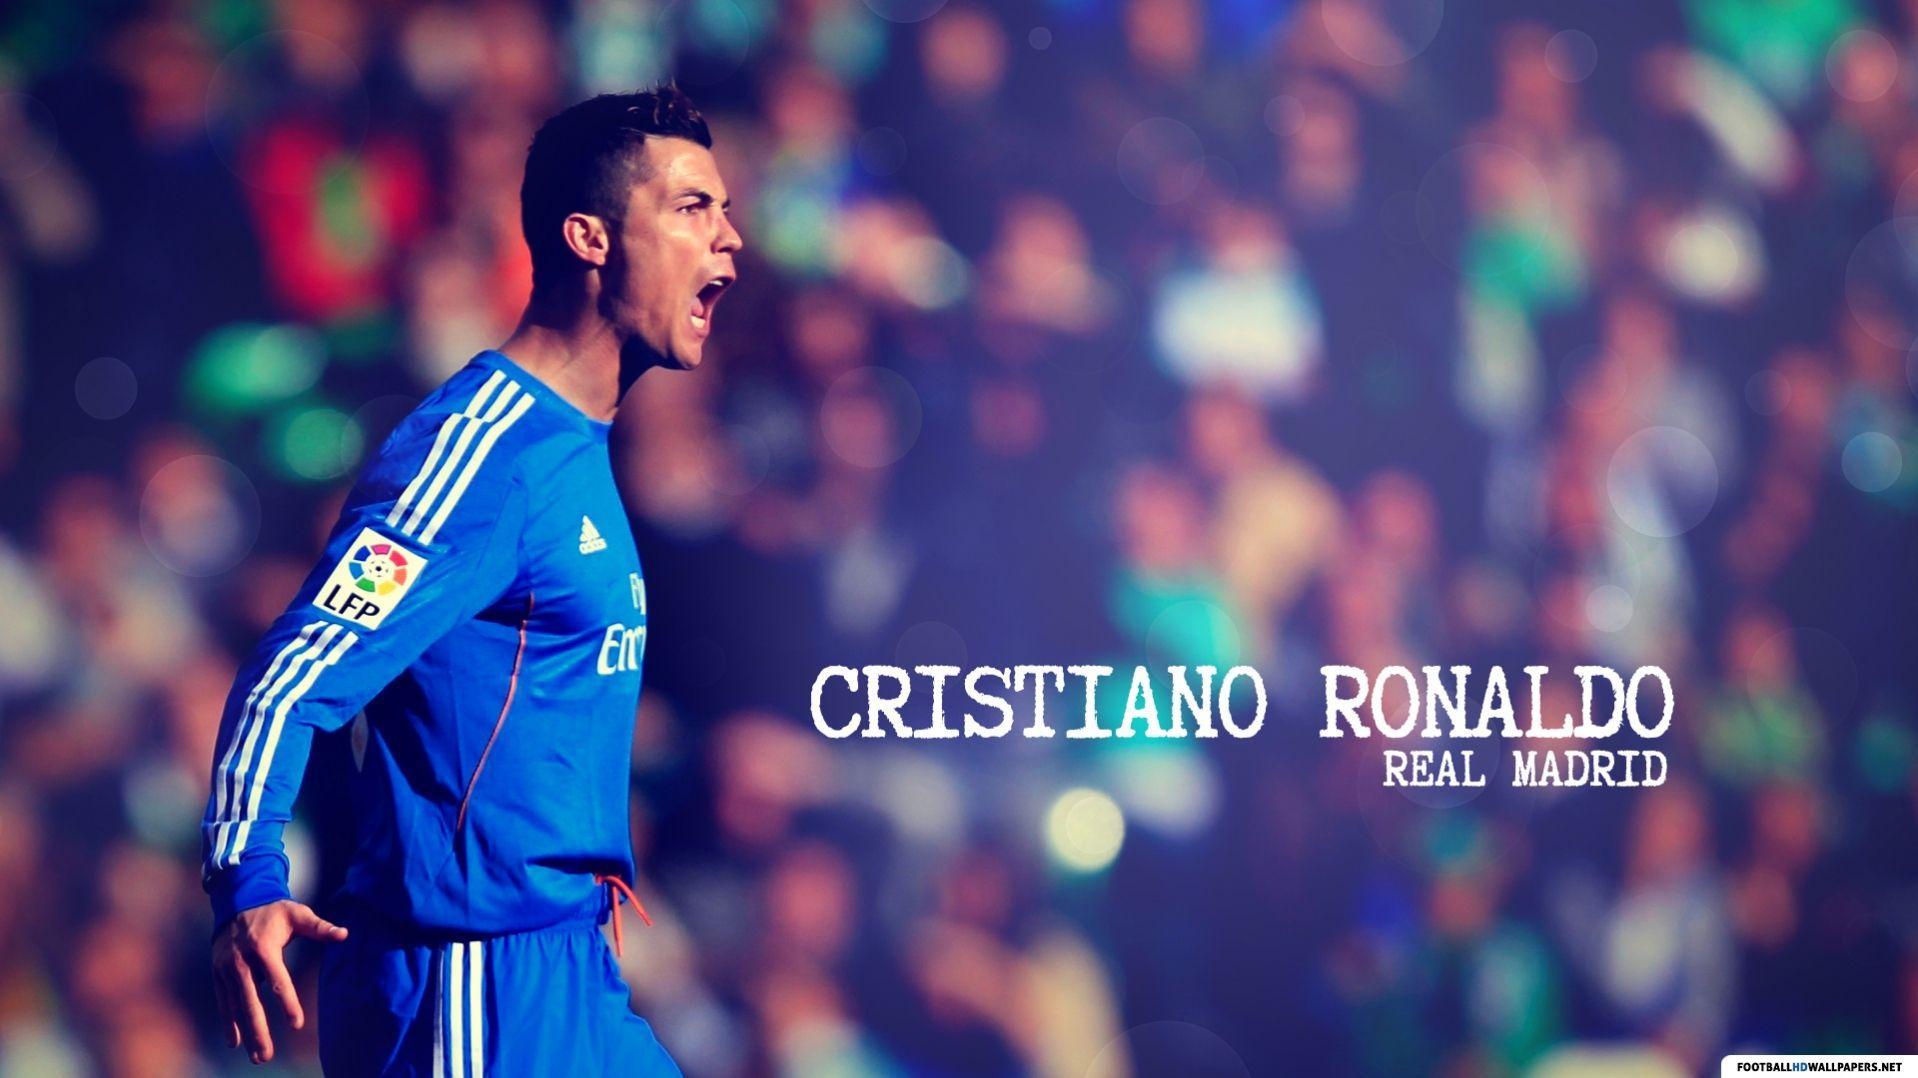 Cristiano Ronaldo Cool Wallpapers